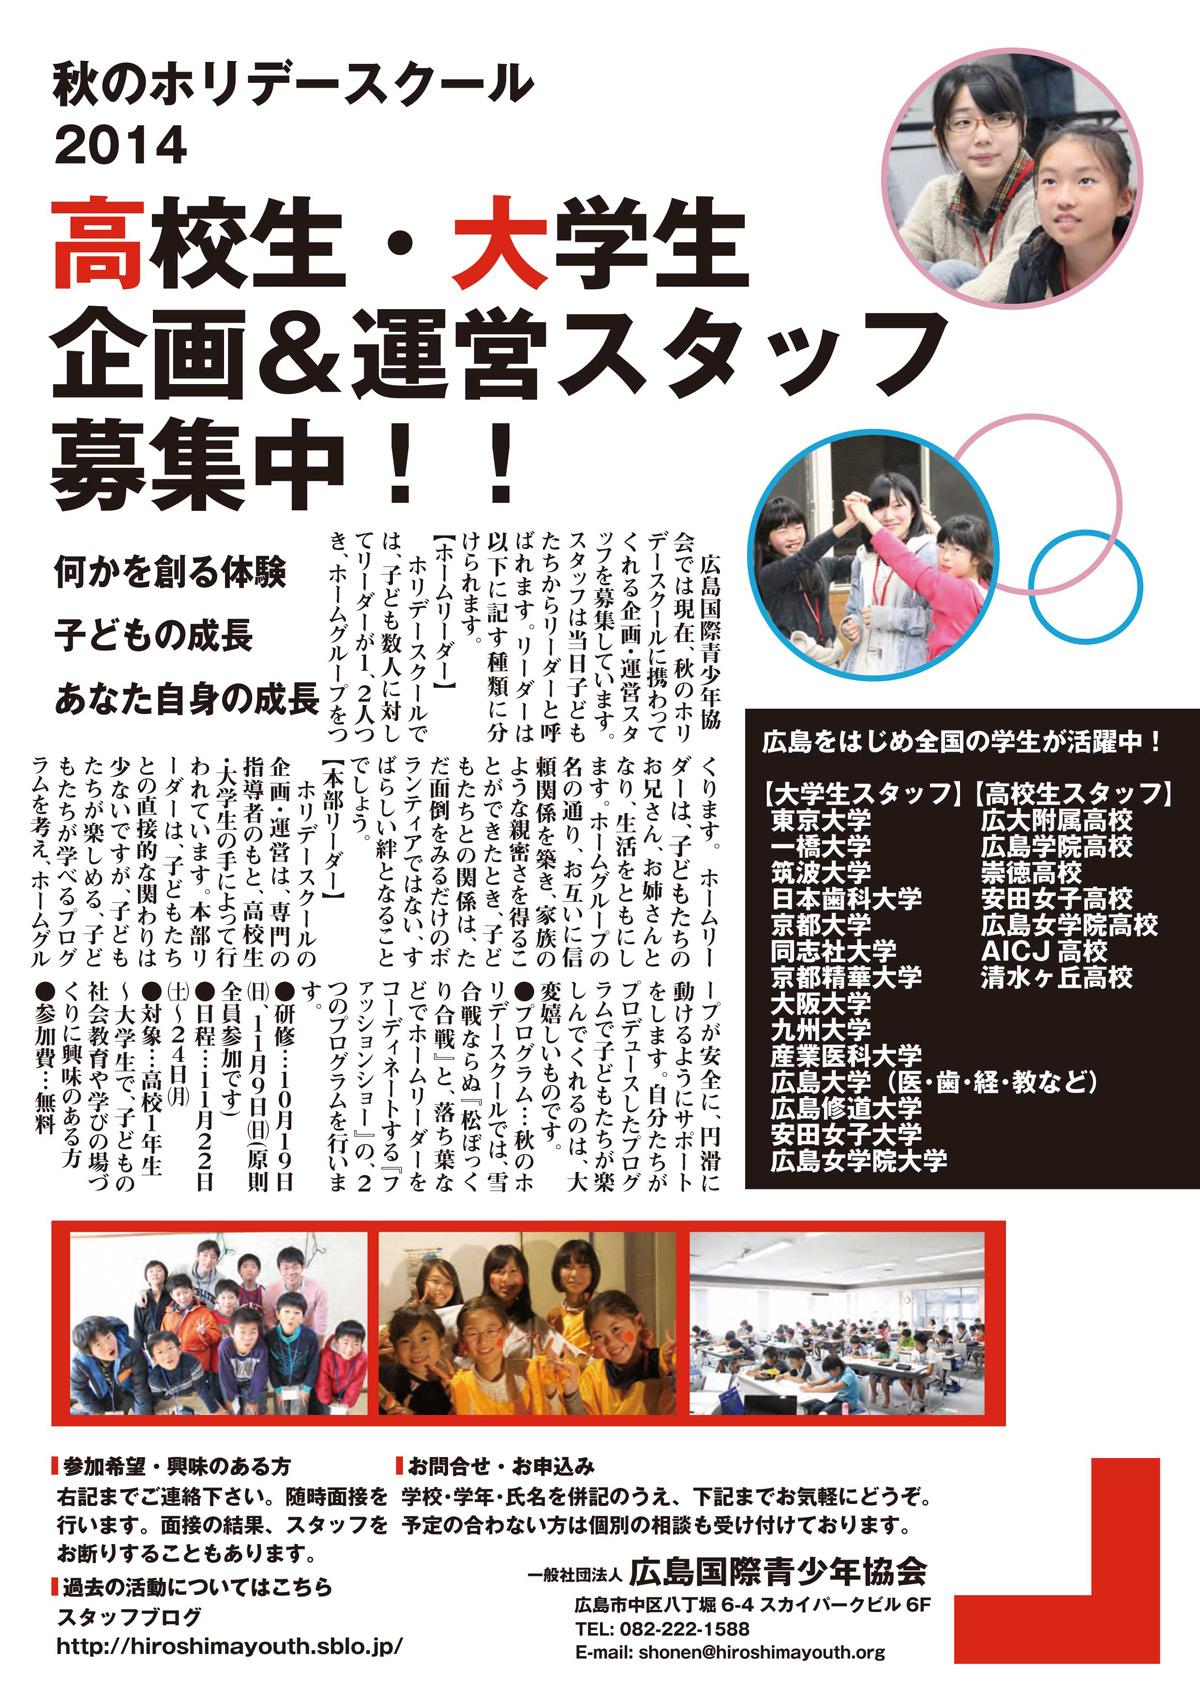 20141001_AHS2014スタッフ募集ポスタ.jpg